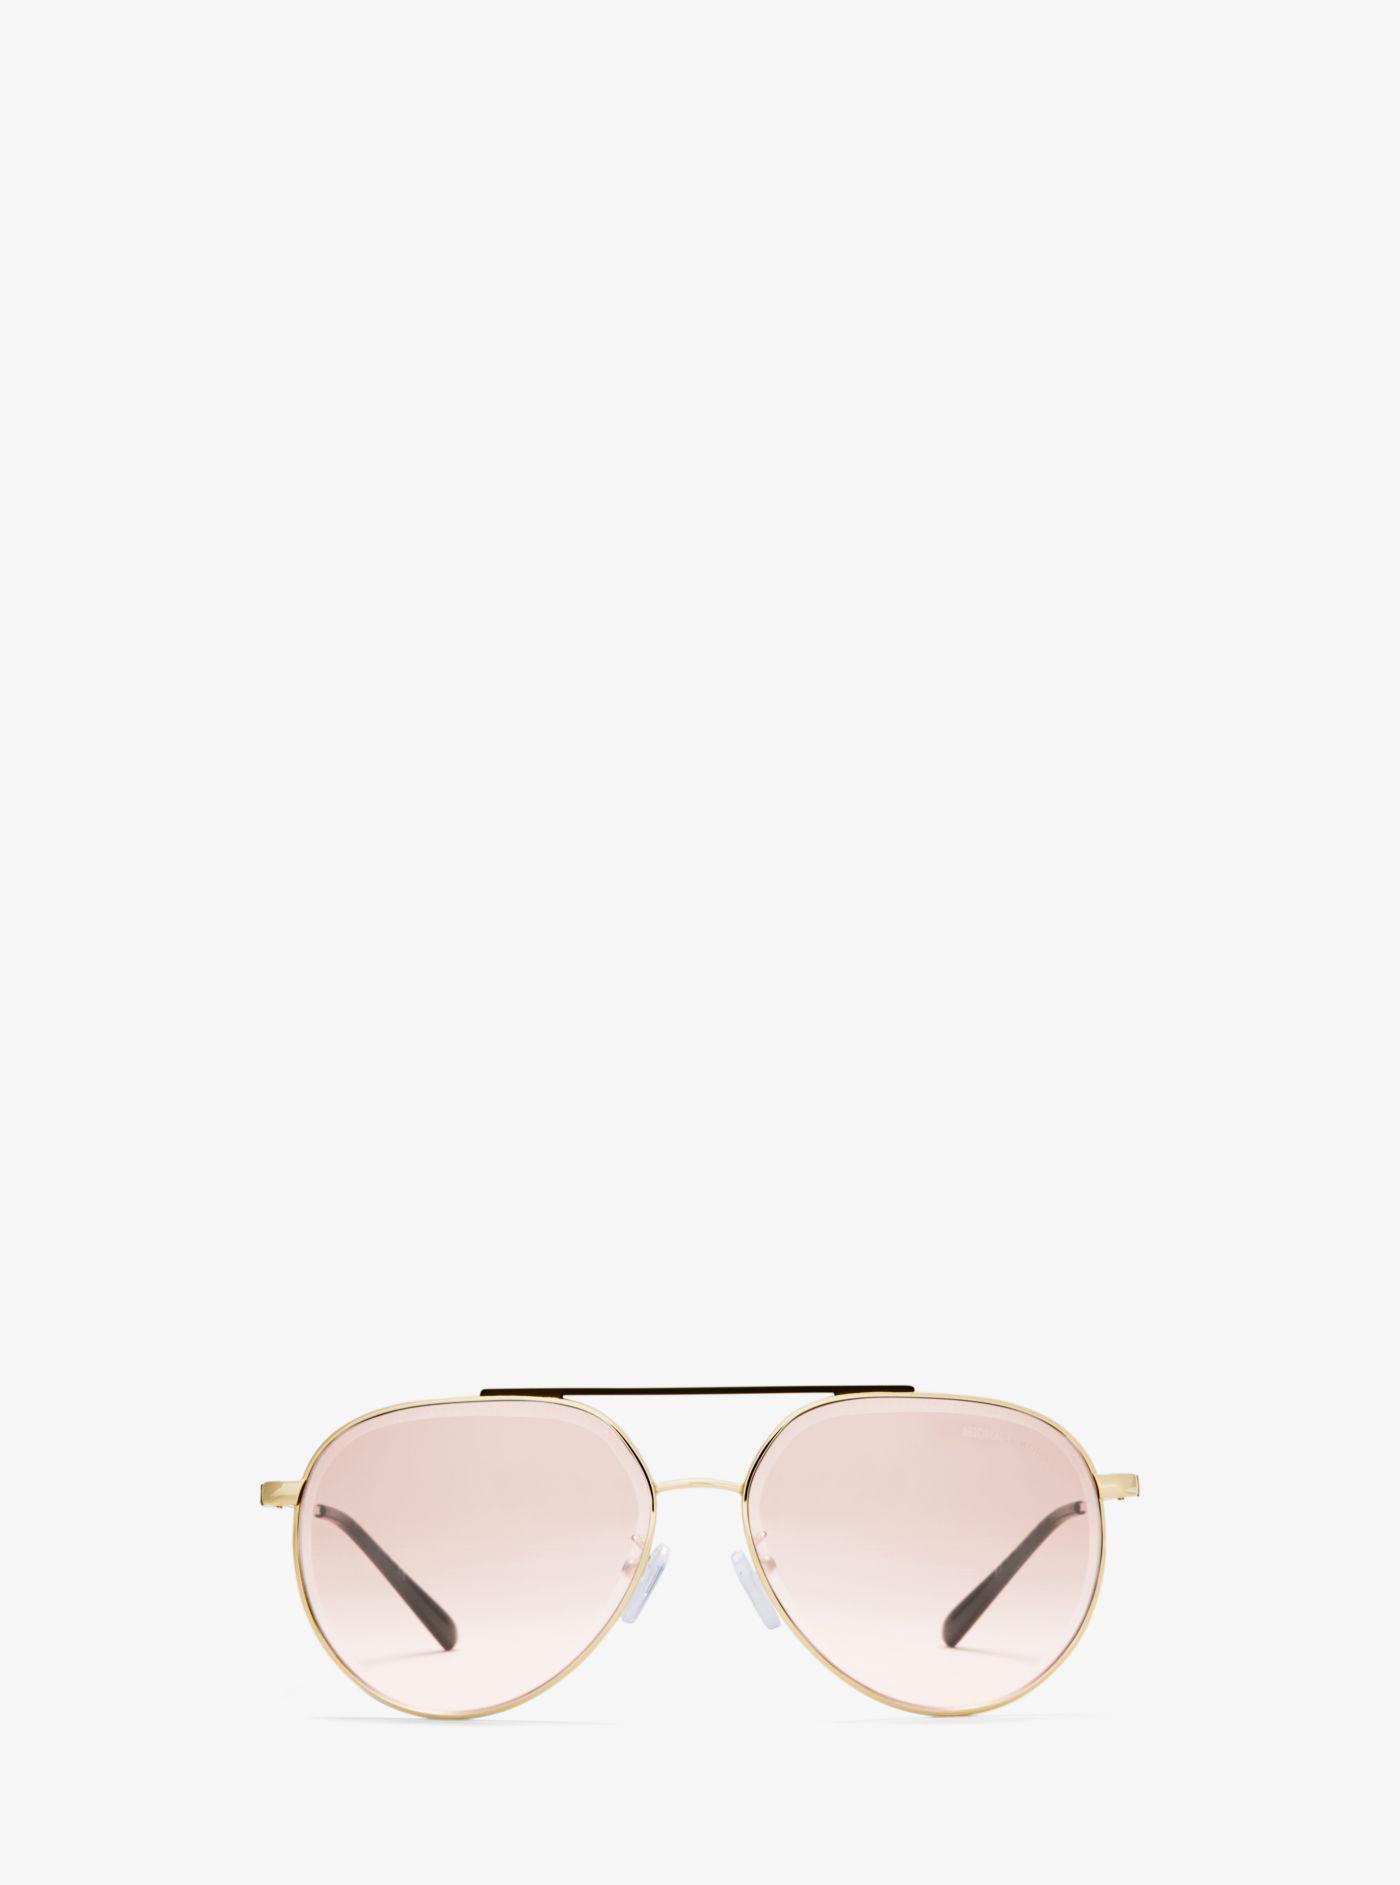 michael kors antigua sunglasses lyst Oakley Crankcase Sunglasses Purple michael kors women s antigua sunglasses